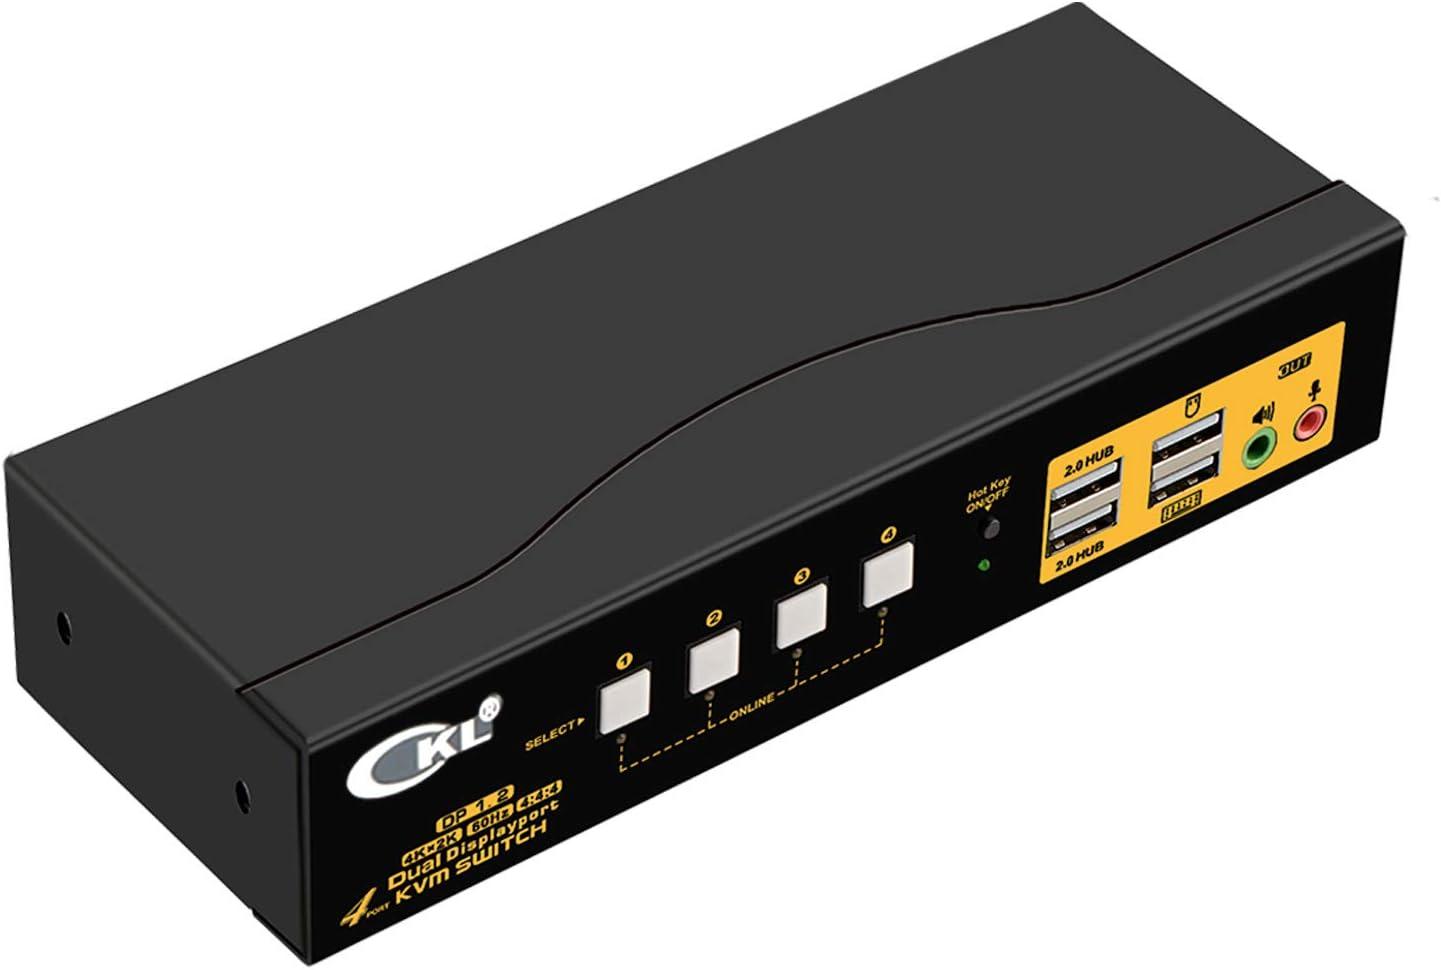 CKL KVM Switch Dual Monitor DisplayPort 4 Port 4K 60Hz 4:4:4, 4x2 DP KVM Switch with Audio and USB 2.0 HUBs (CKL-642DP)